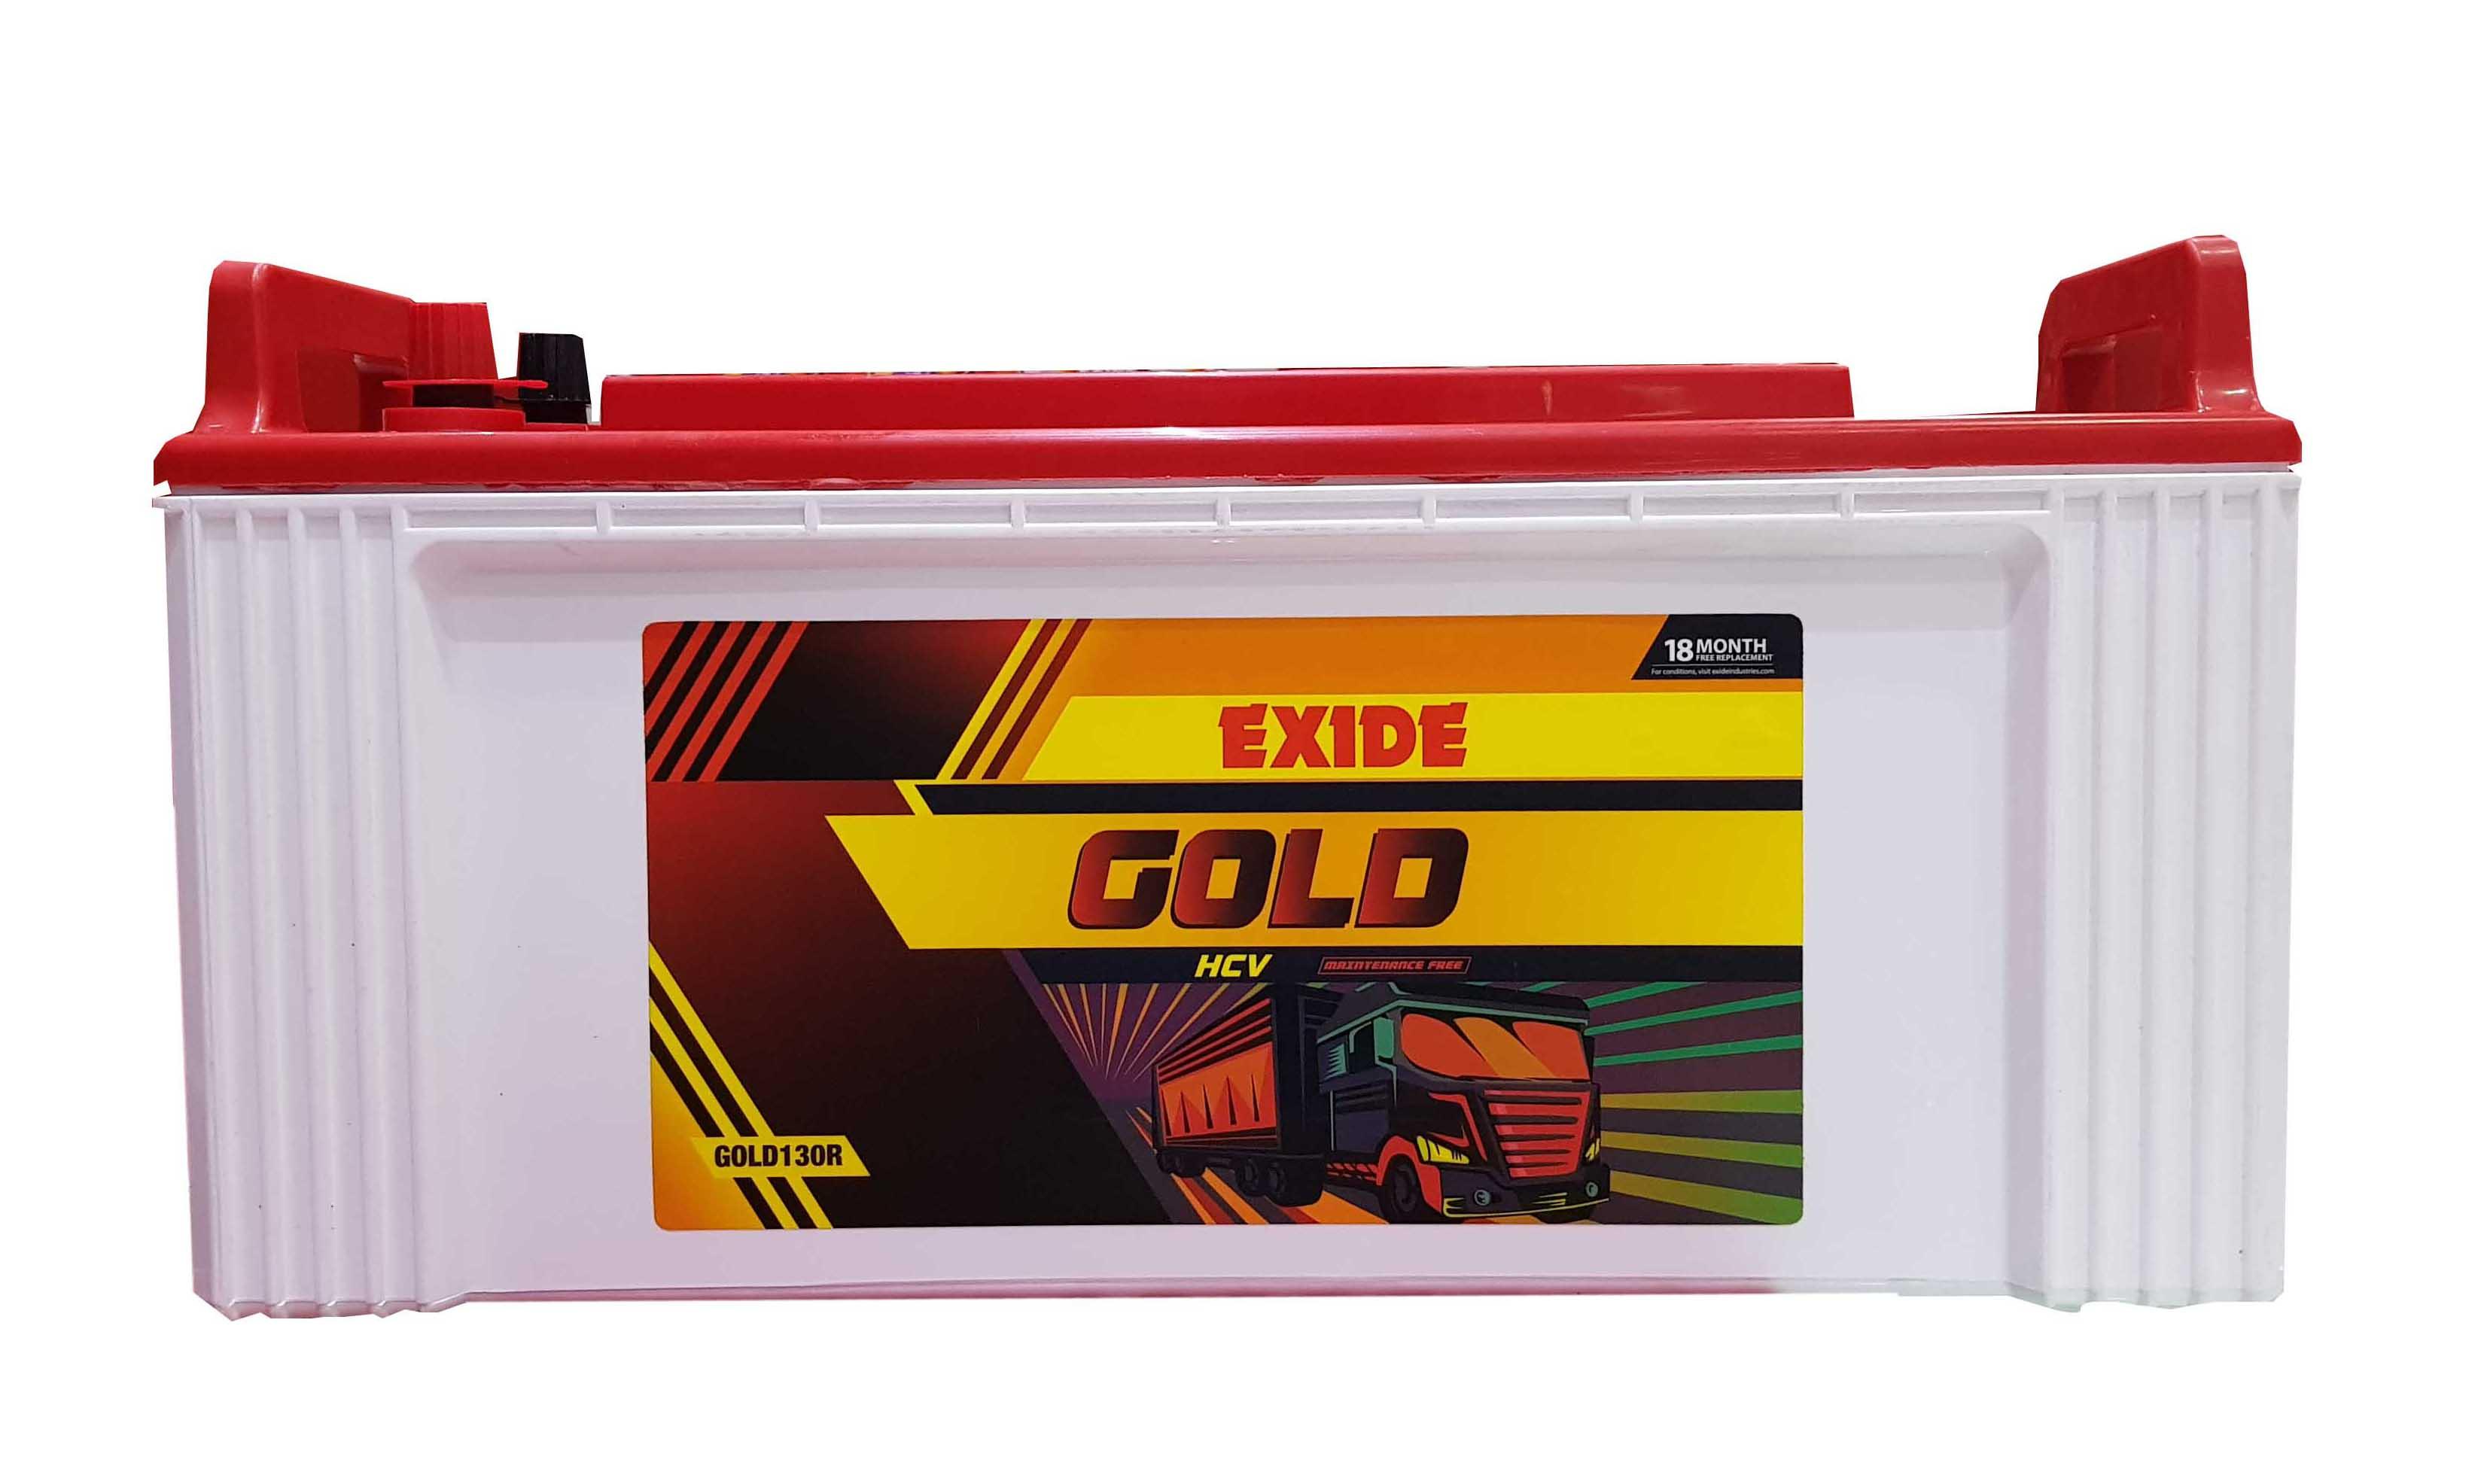 Exide Gold battery for truck 130 ah